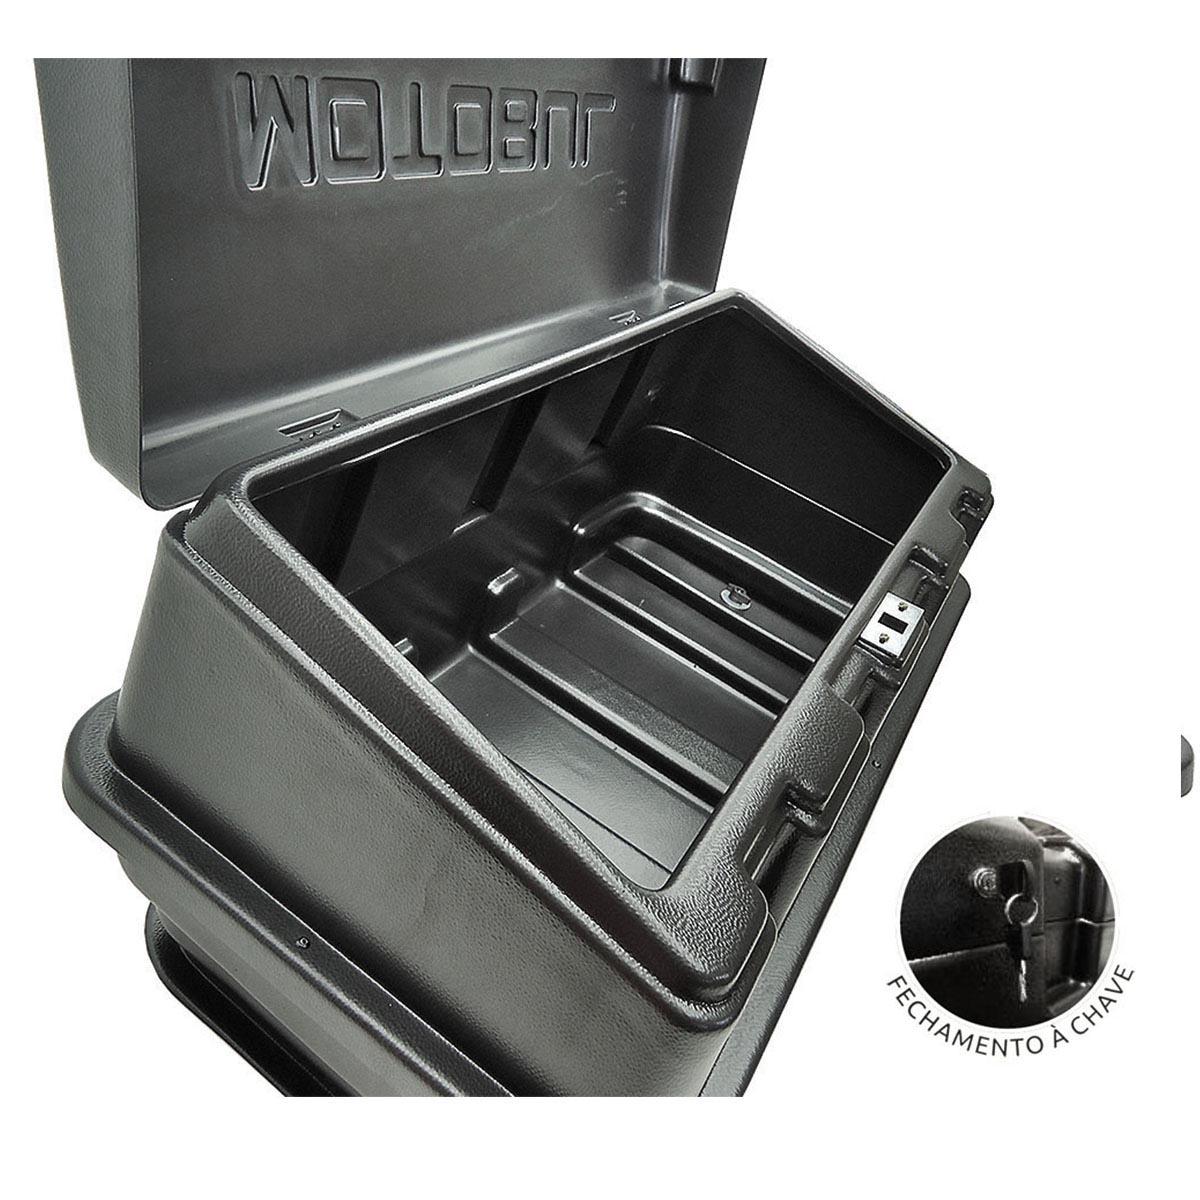 Caixa para ca�amba com chave L200 GL 1999 a 2005 ou L200 GLS 1999 a 2007